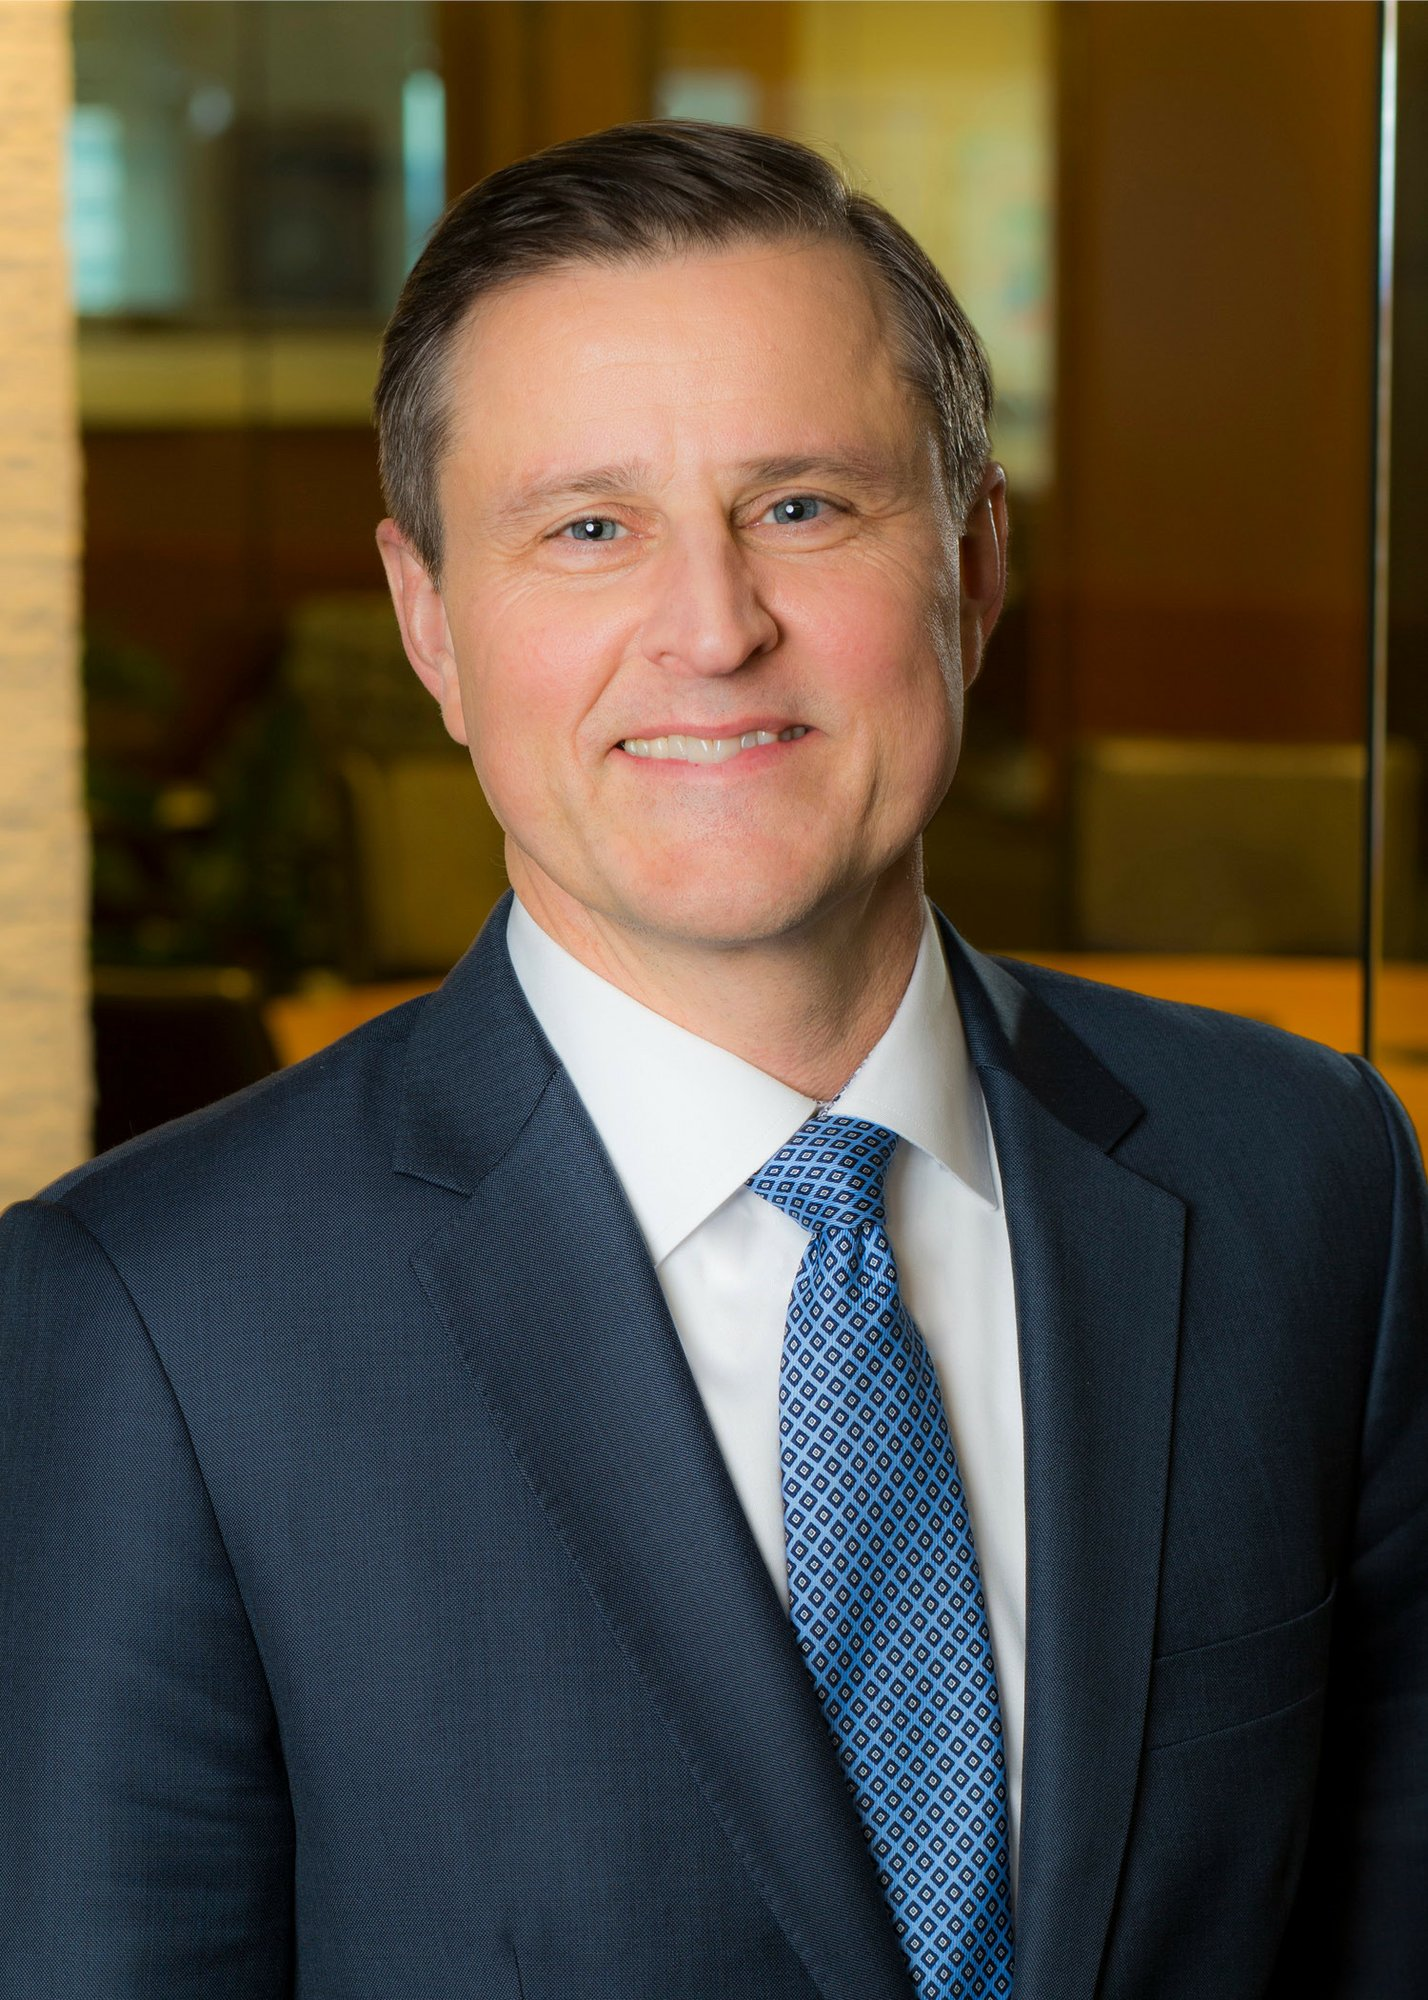 loomis sayles investment grade bond summary prospectus rules